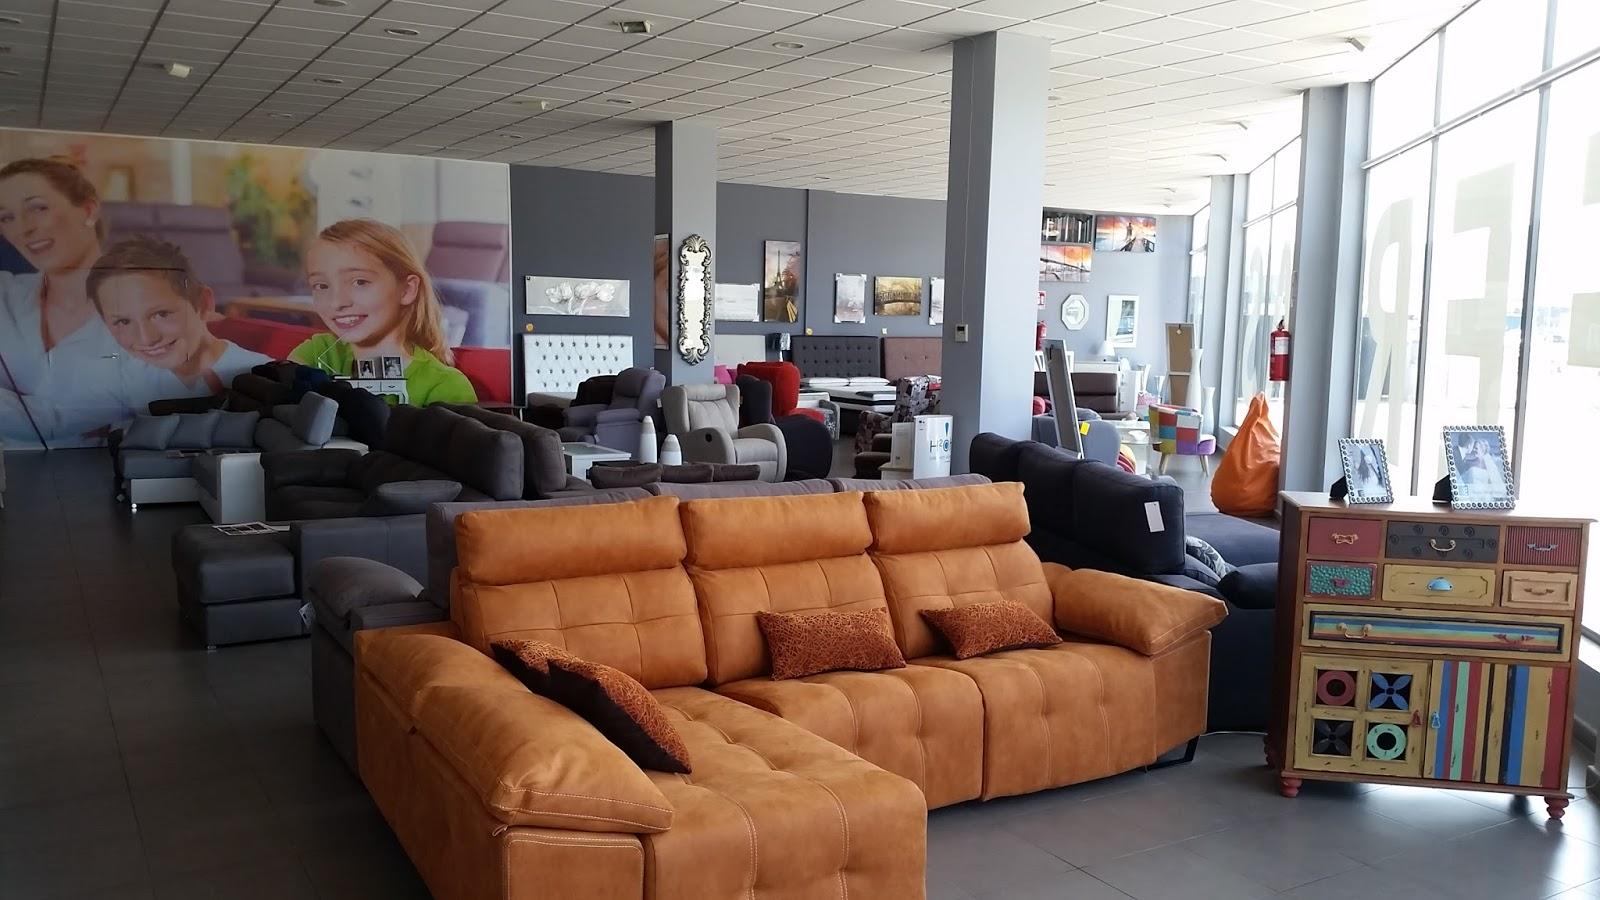 Muebles naluna interesting com muebles en castelln venta for Muebles naluna